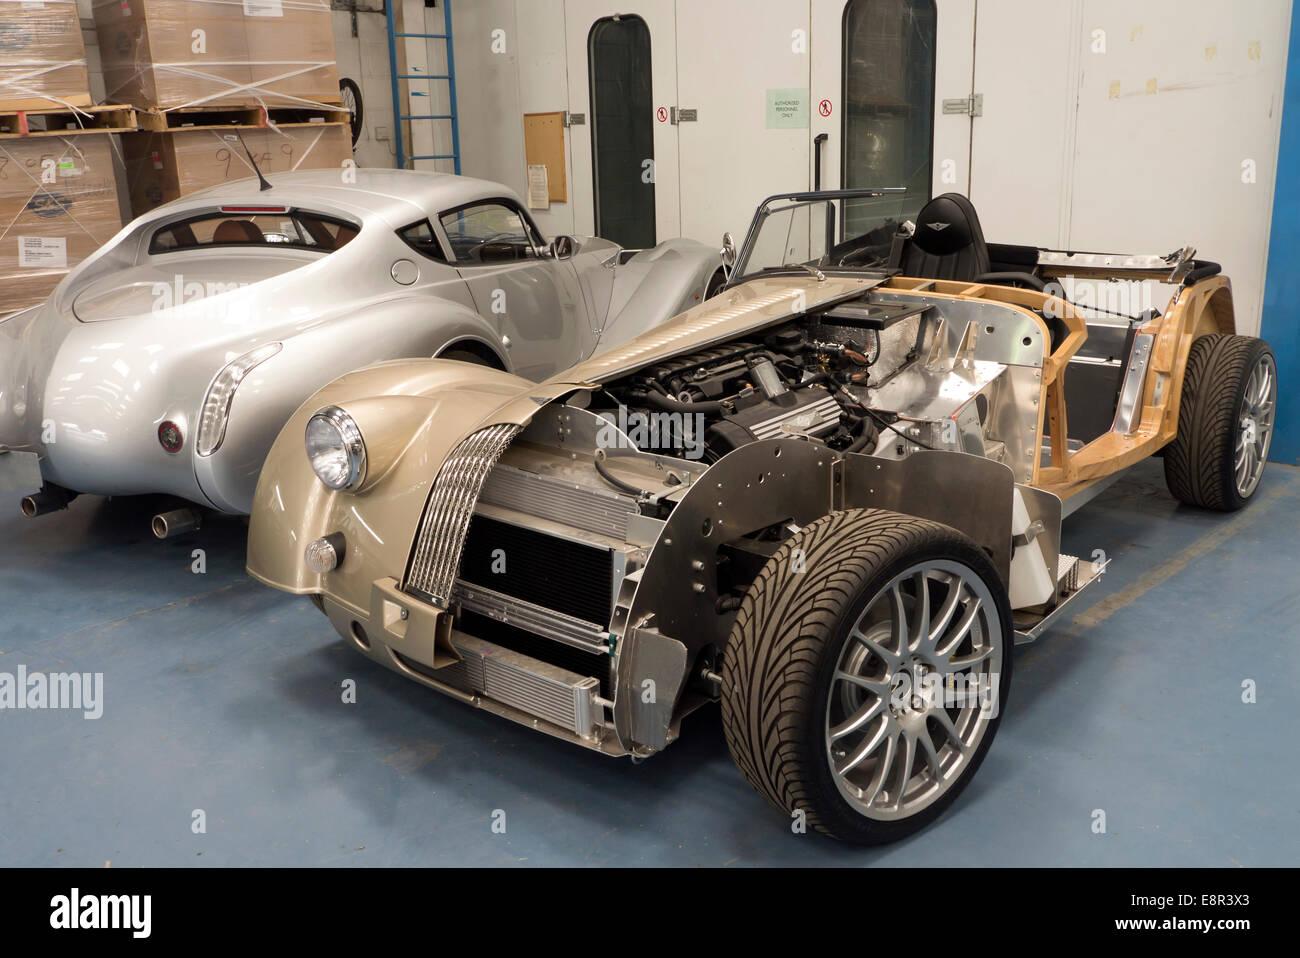 Morgan Plus 8 Genfer Autosalon Anzeige Auto In Der Morgan Fabrik